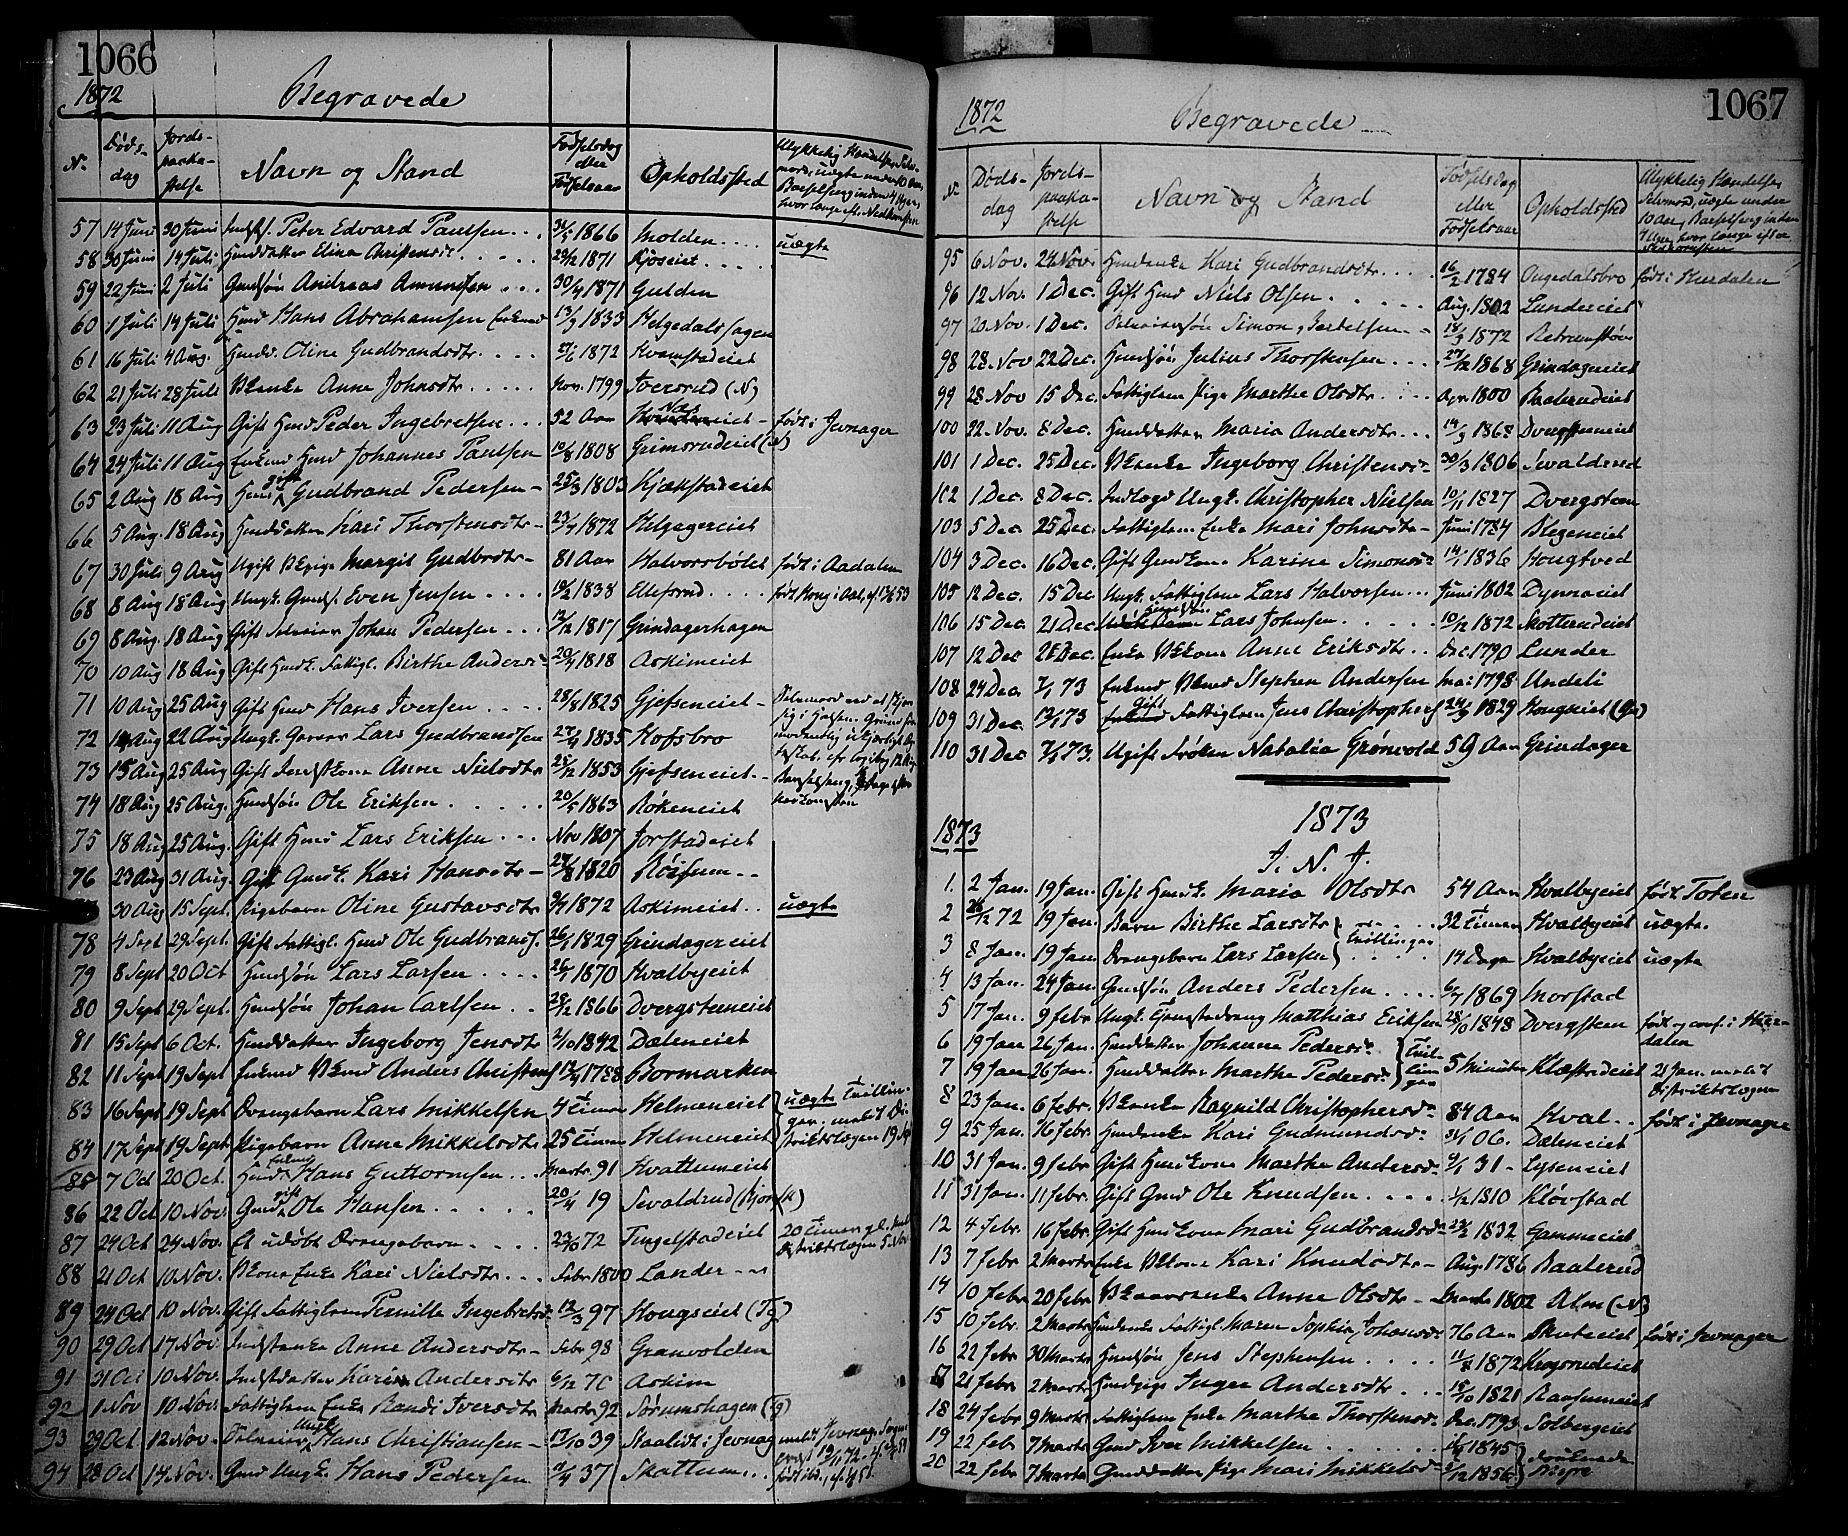 SAH, Gran prestekontor, Ministerialbok nr. 12, 1856-1874, s. 1066-1067